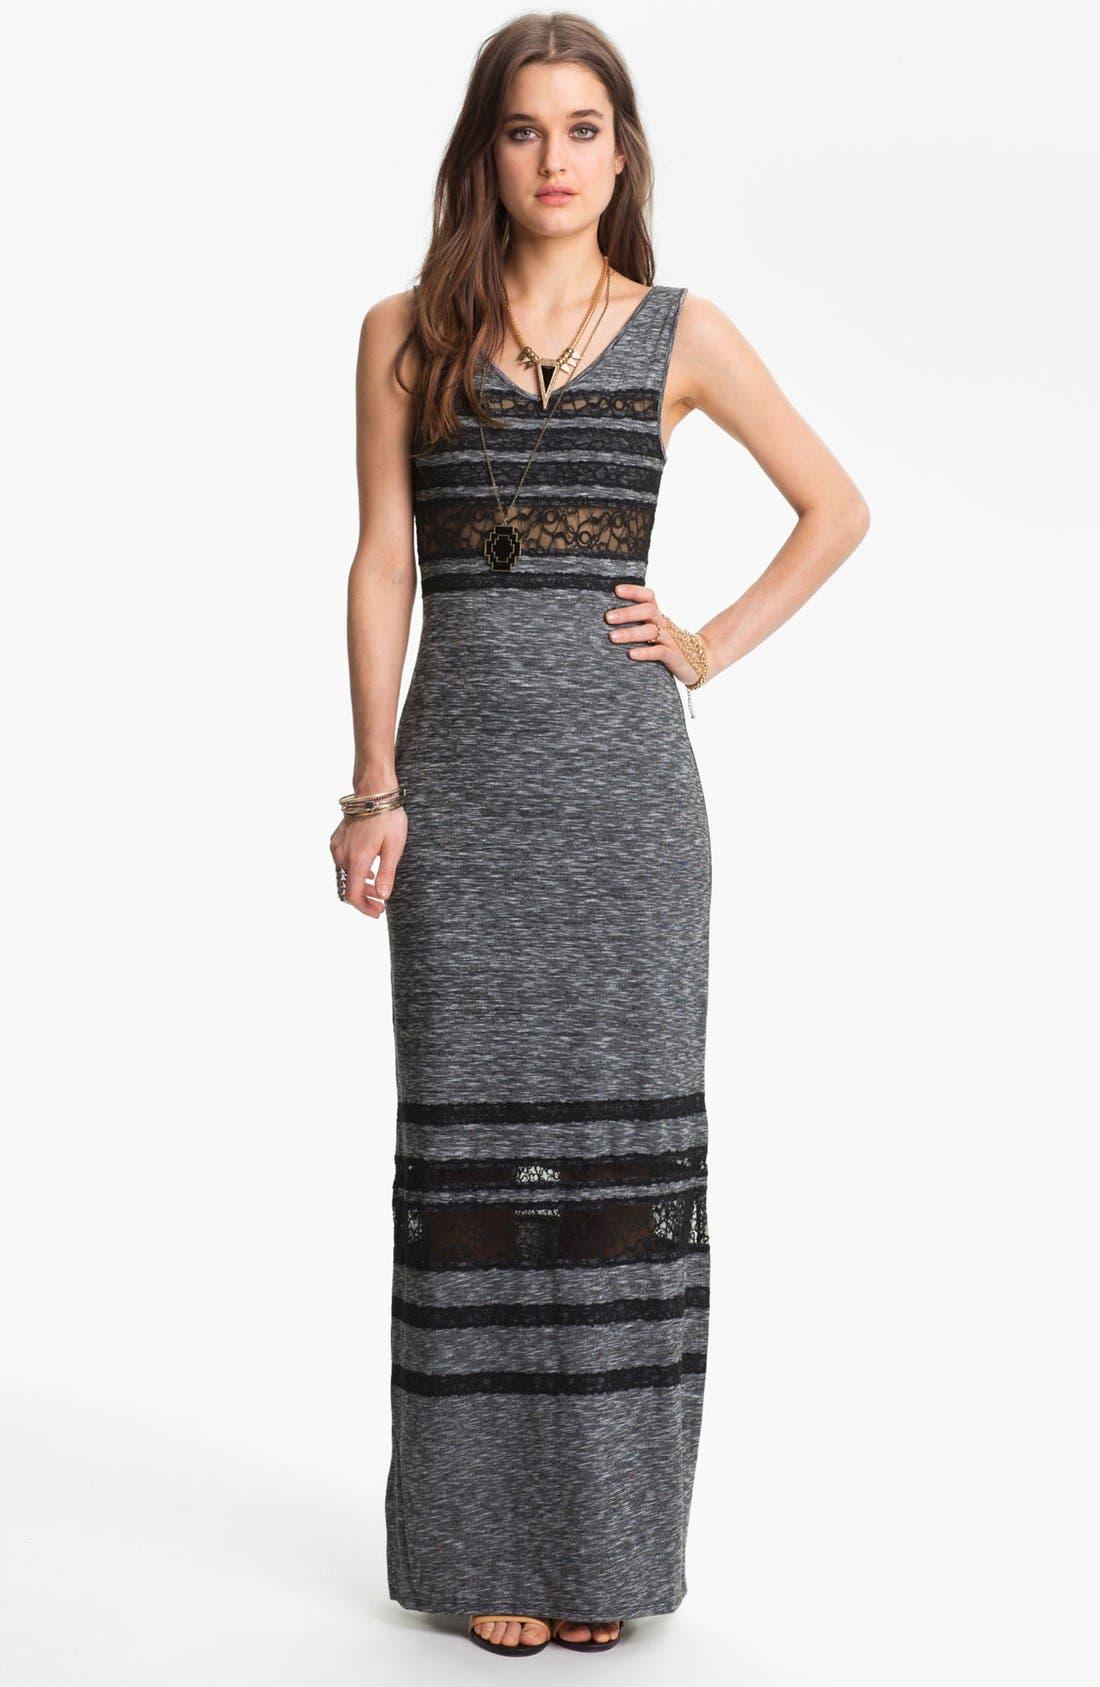 Main Image - Free People 'Hazy Day' Lace Stripe Maxi Dress